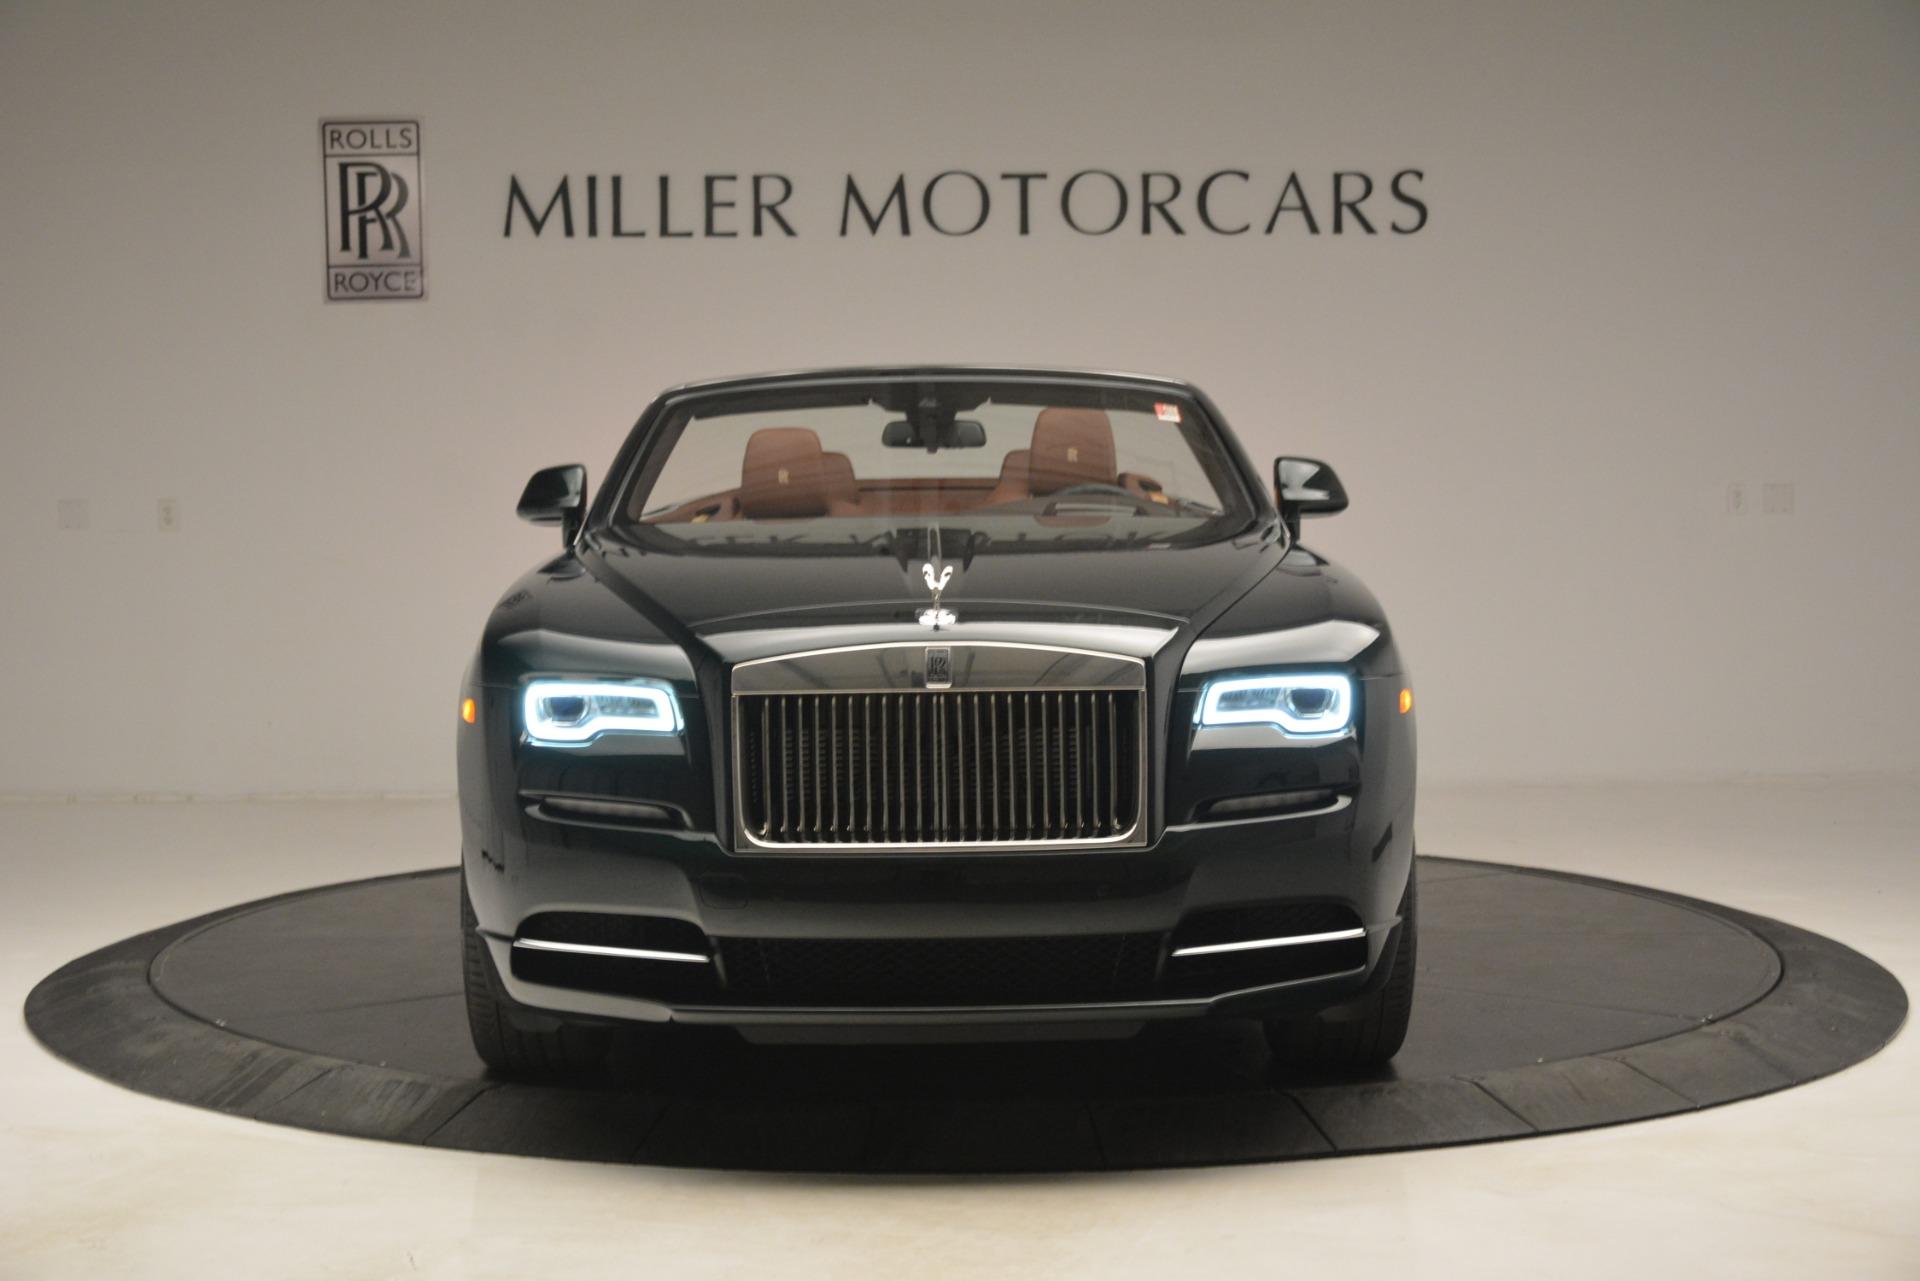 New 2019 Rolls-Royce Dawn  For Sale In Greenwich, CT 2722_p2